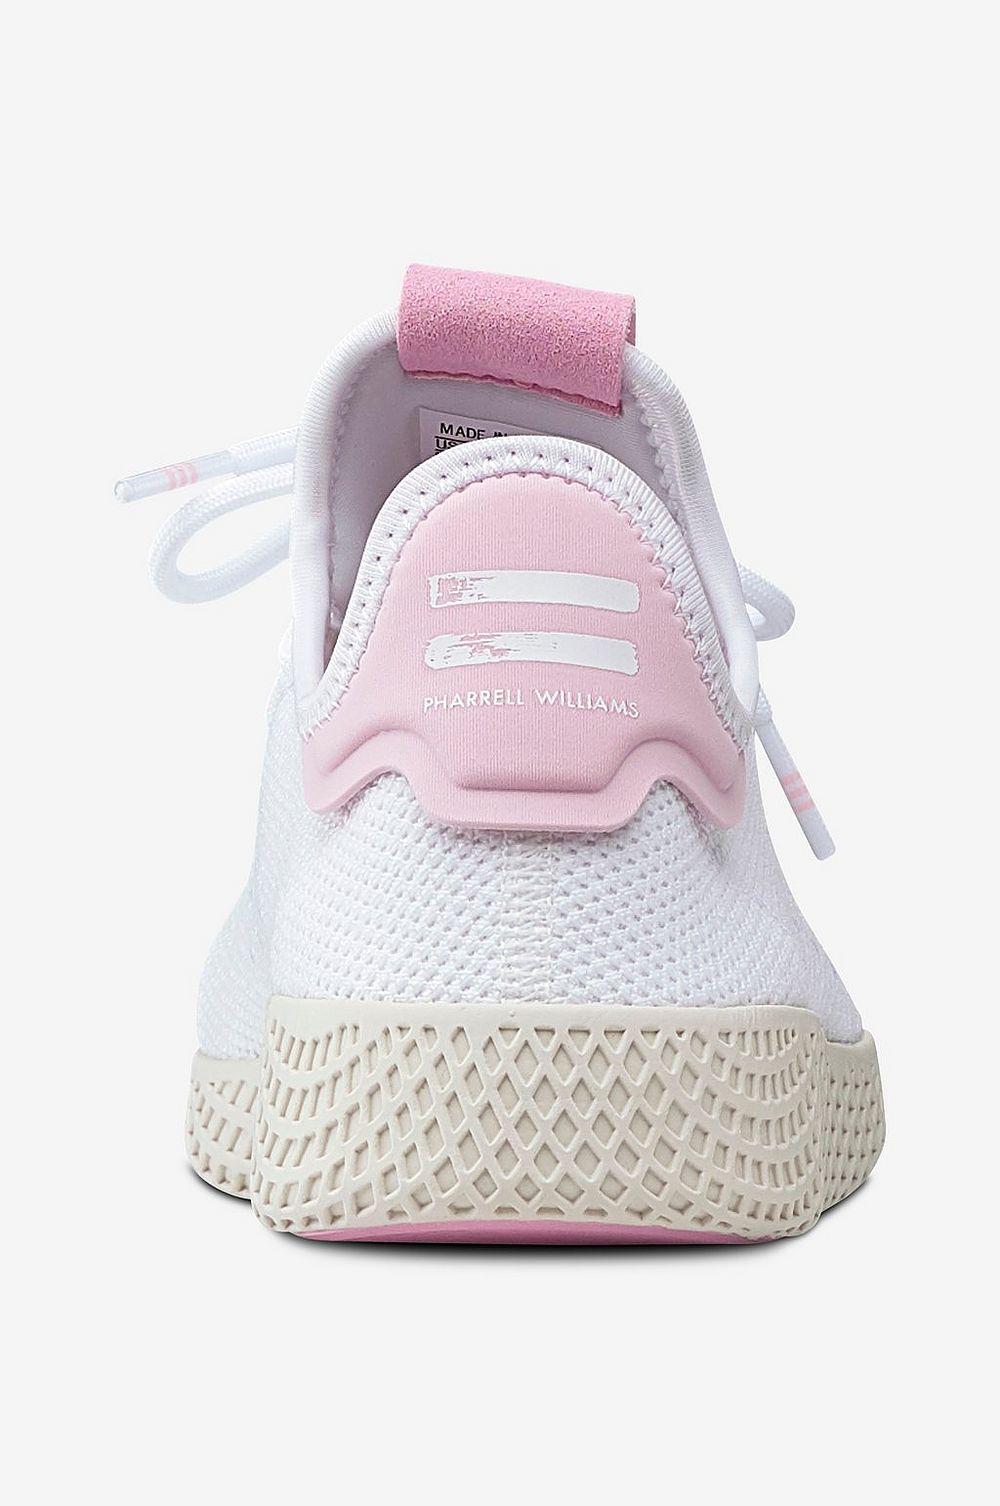 timeless design 1a81e c7b22 adidas Originals Sneakers Pharrell Williams Tennis Hu Shoes - Vit - Dam -  Ellos.se